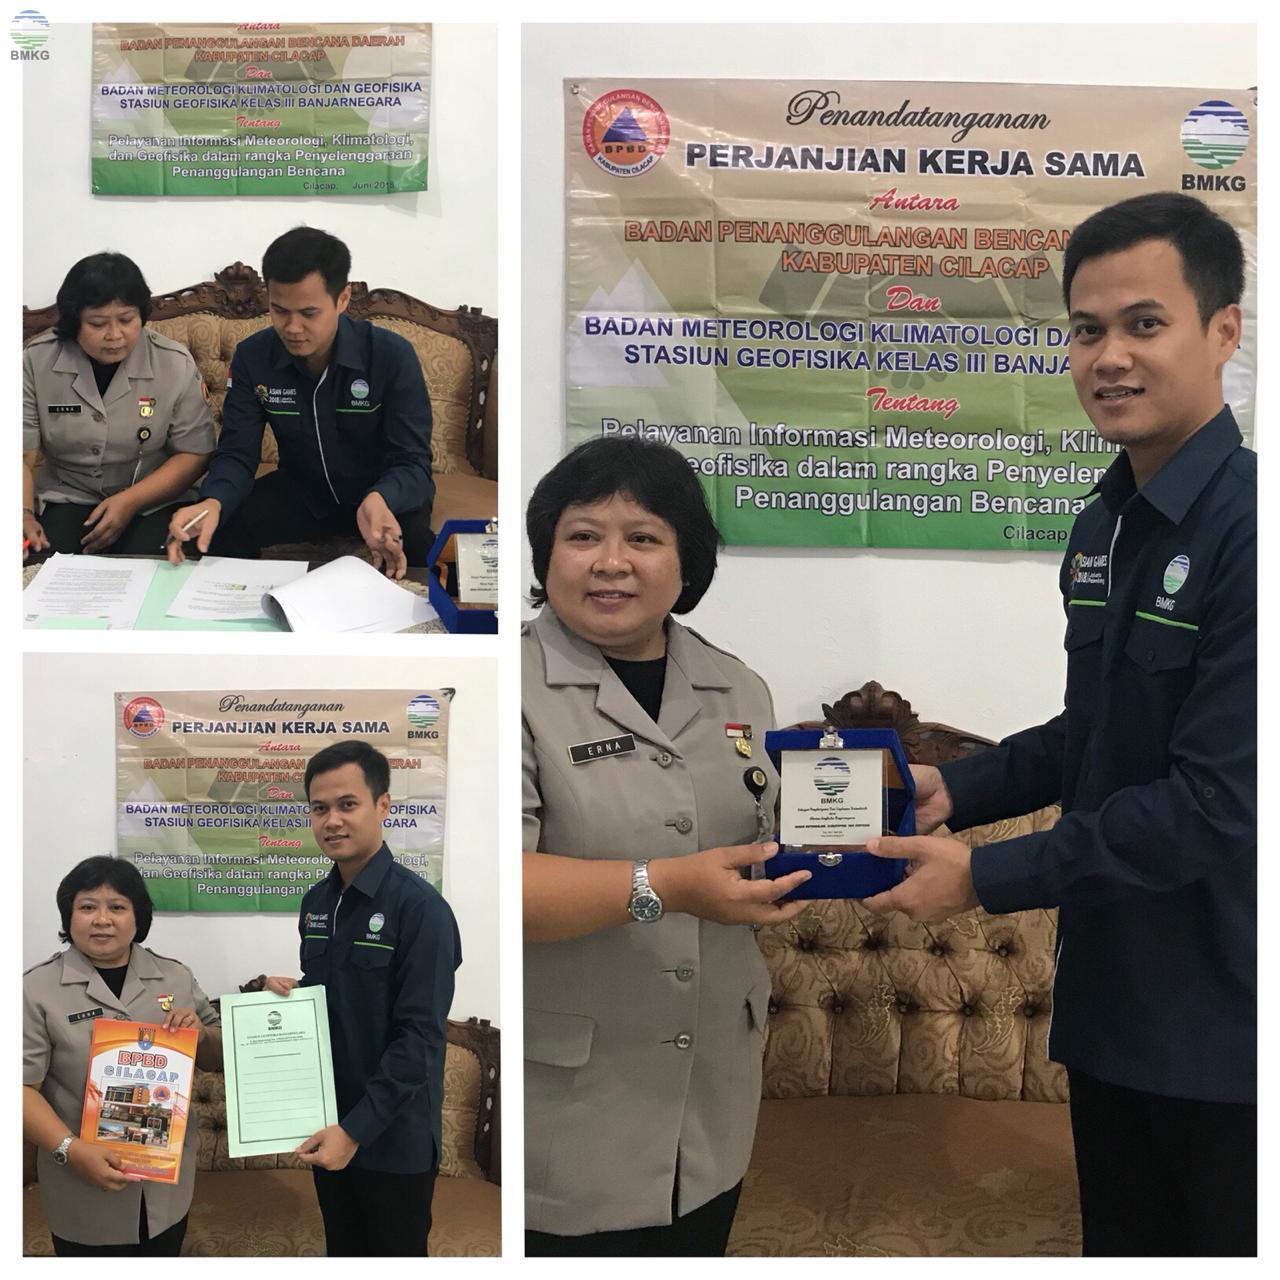 Penandatanganan PKS BMKG Stageof Banjarnegara dengan BPBD Kabupaten Cilacap